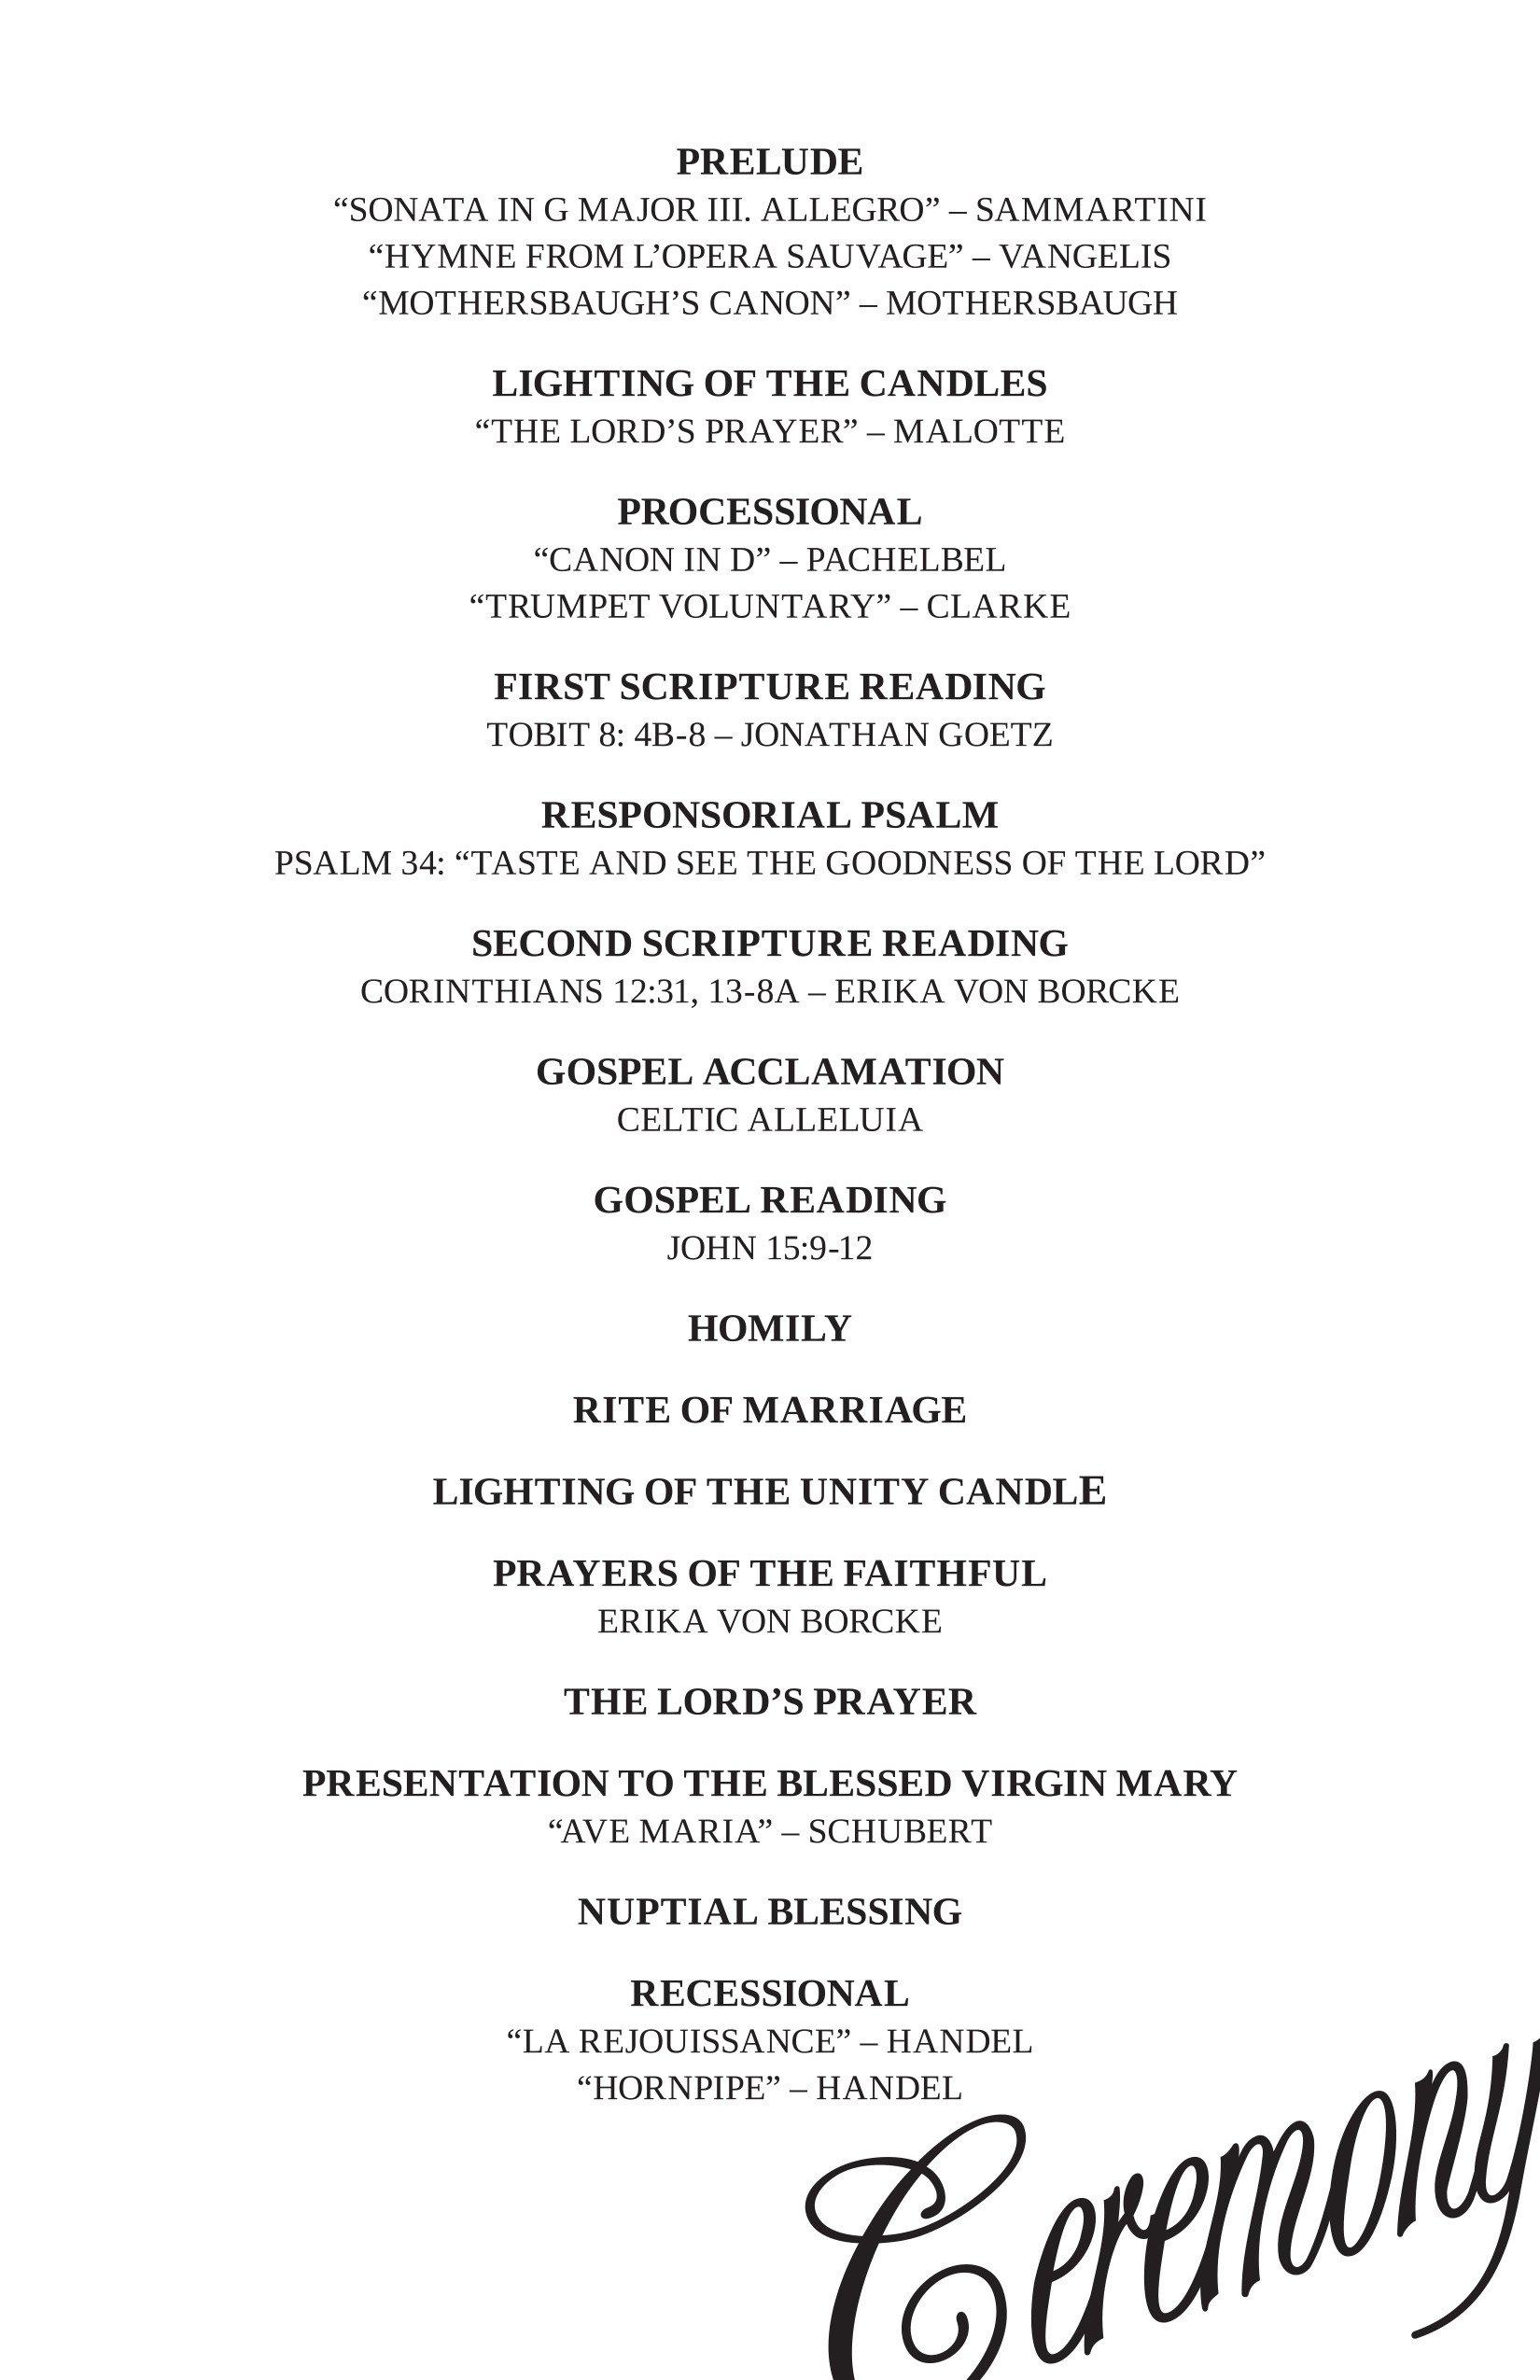 Wedding Reception Program Templates Wedding Reception Program Ideas Wedding Decor Ideas